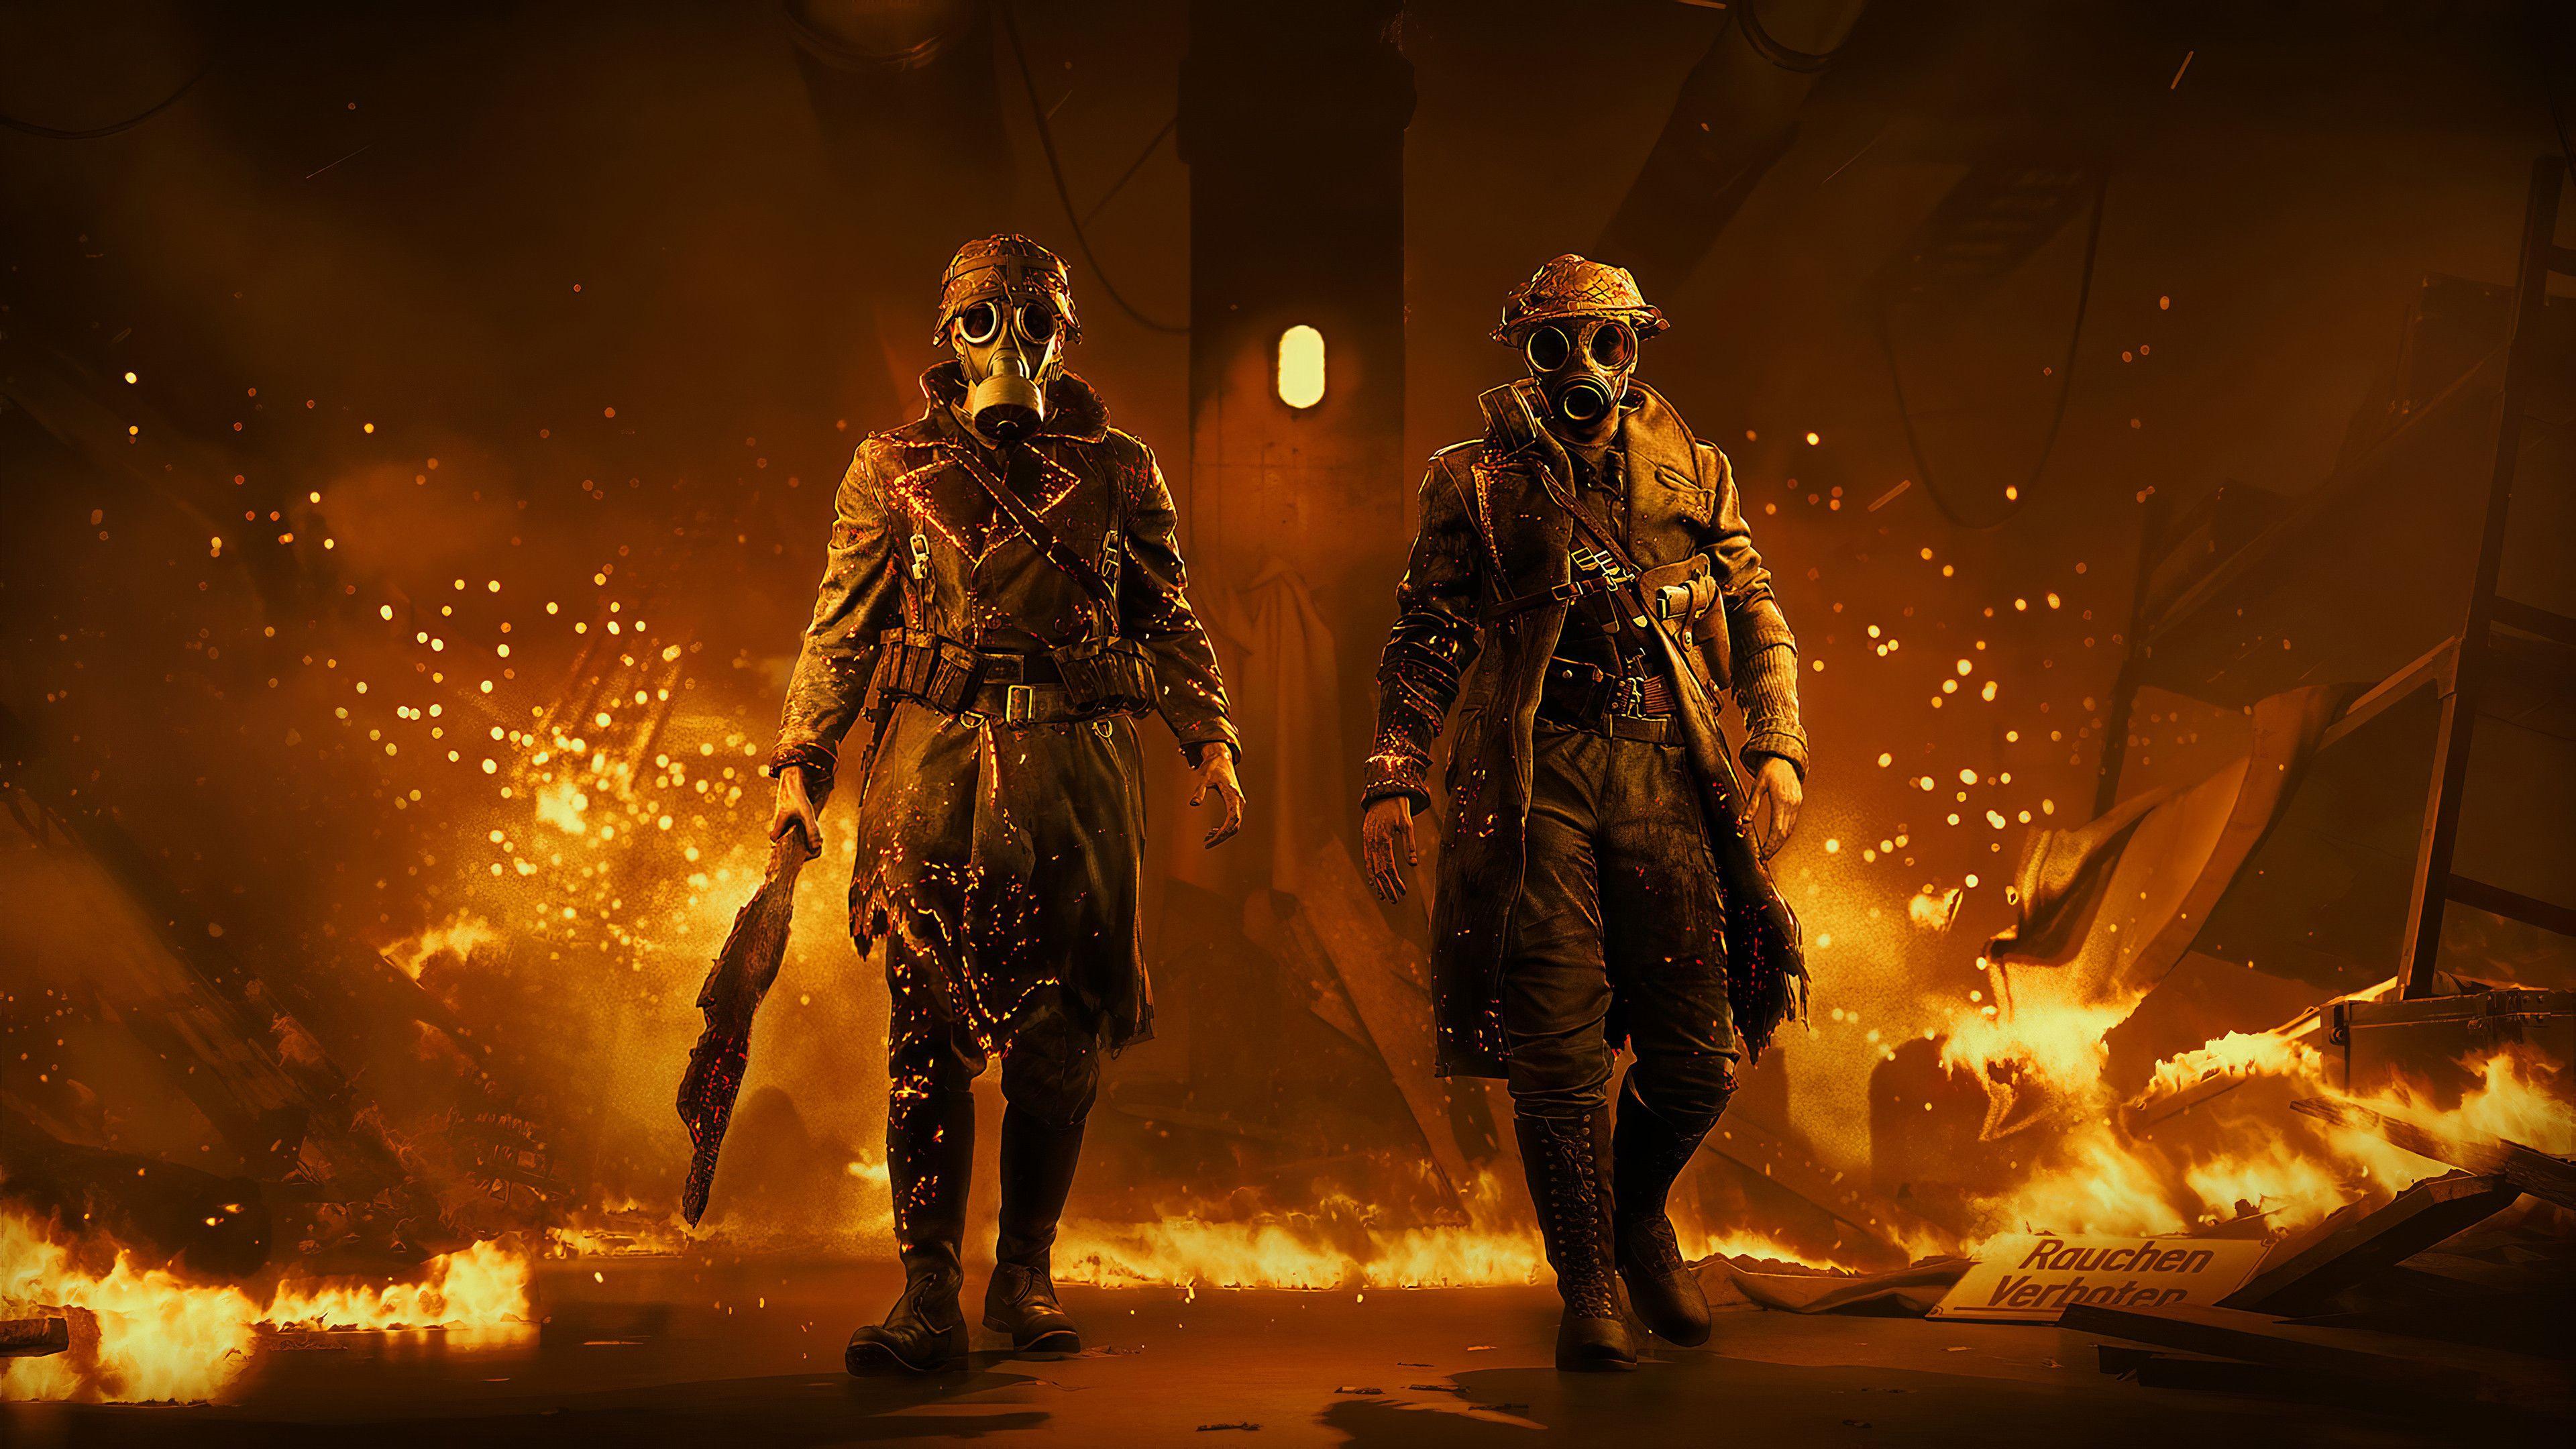 Battlefield 5 Art Battlefield 5 Wallpapers Battlefield 5 Art 4k Wallapper Battlefield 4k Wallpapers In 2020 Battlefield Go Wallpaper Battlefield 5